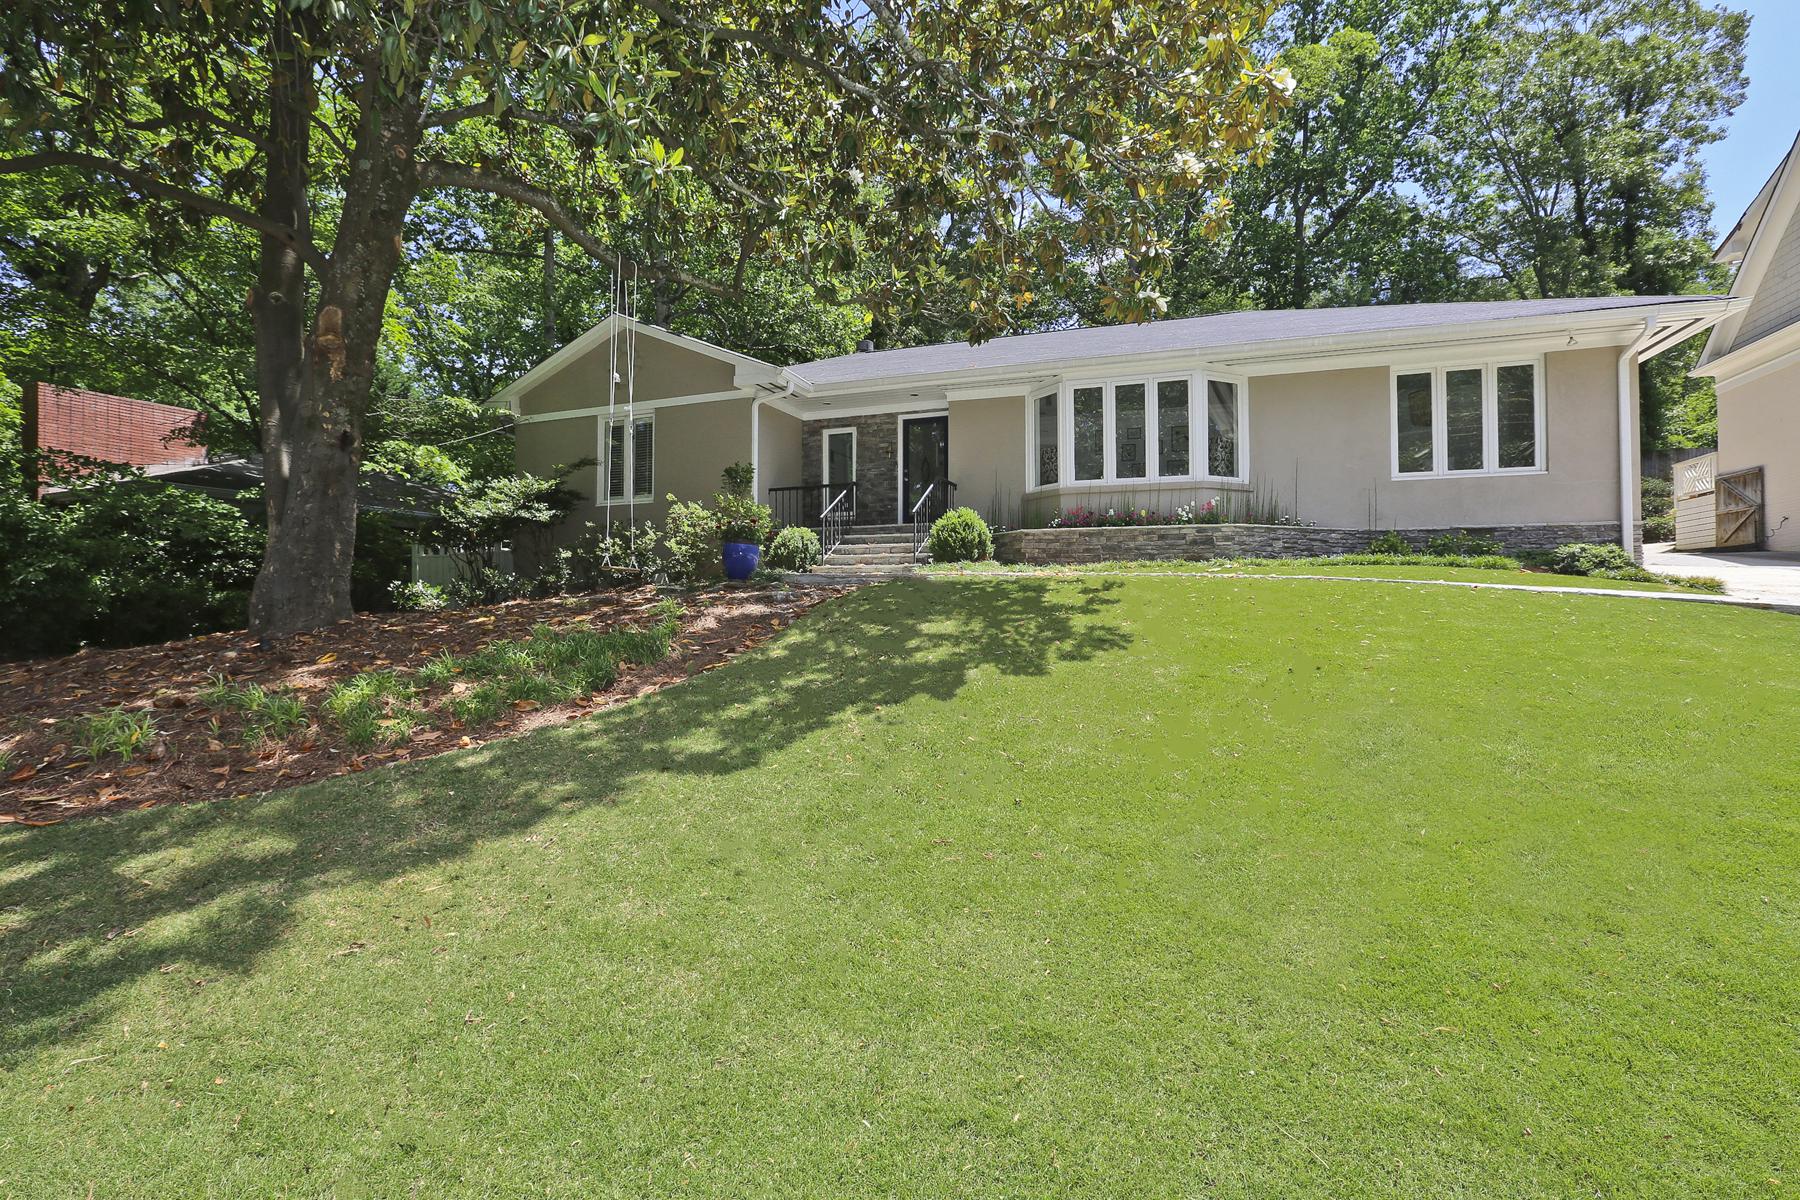 Moradia para Venda às Impeccable Totally Renovated Home In Morningside 1715 Wildwood Road NE Morningside, Atlanta, Geórgia, 30306 Estados Unidos